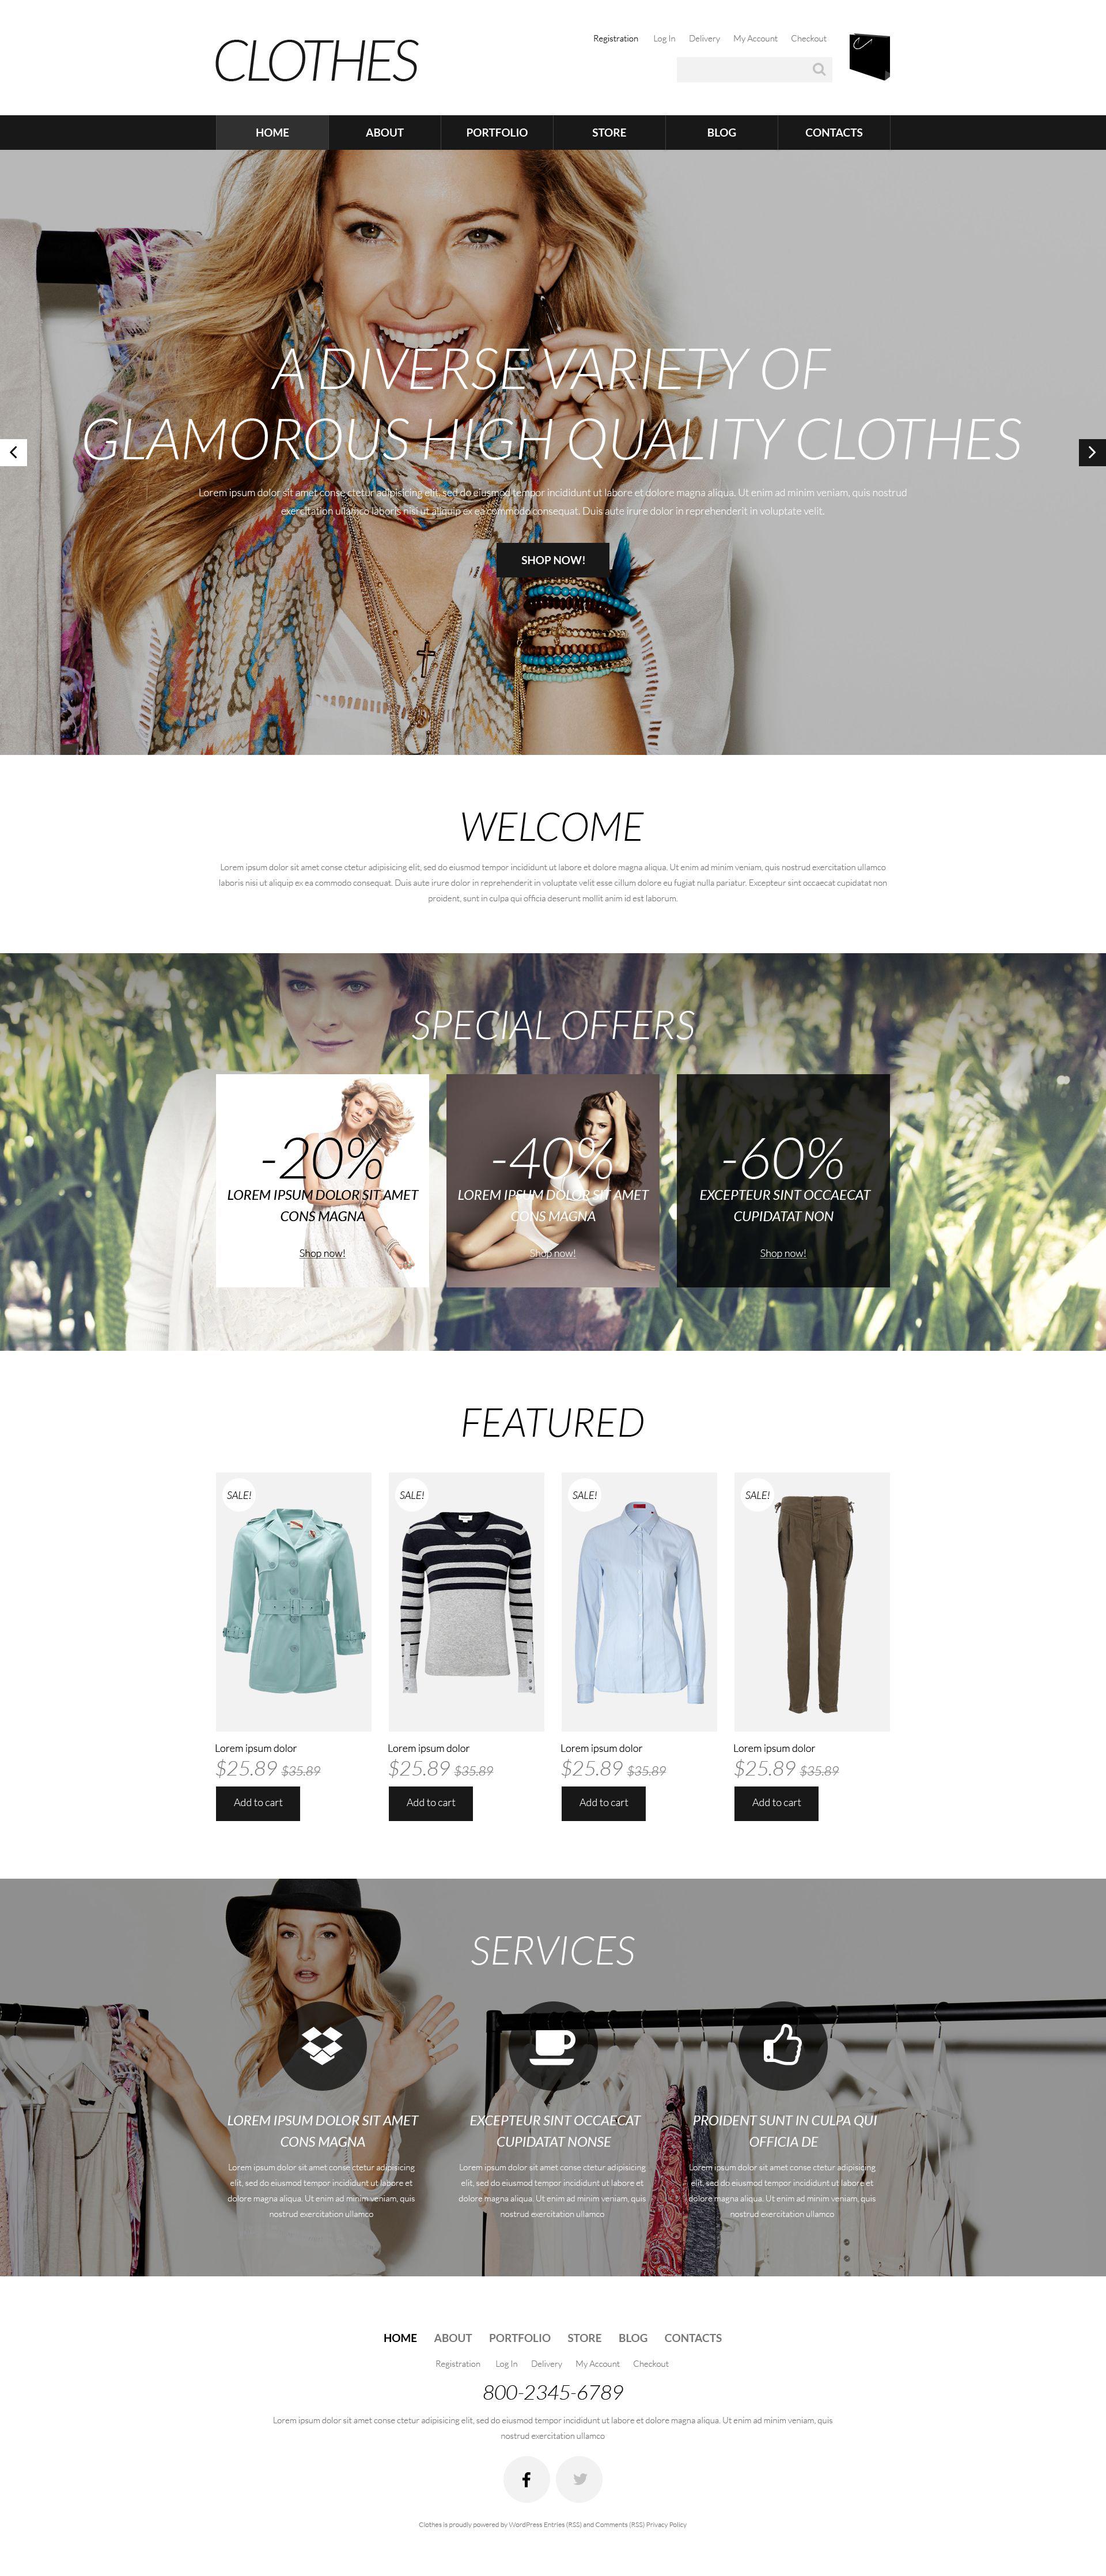 Designer Clothes WooCommerce Theme - screenshot